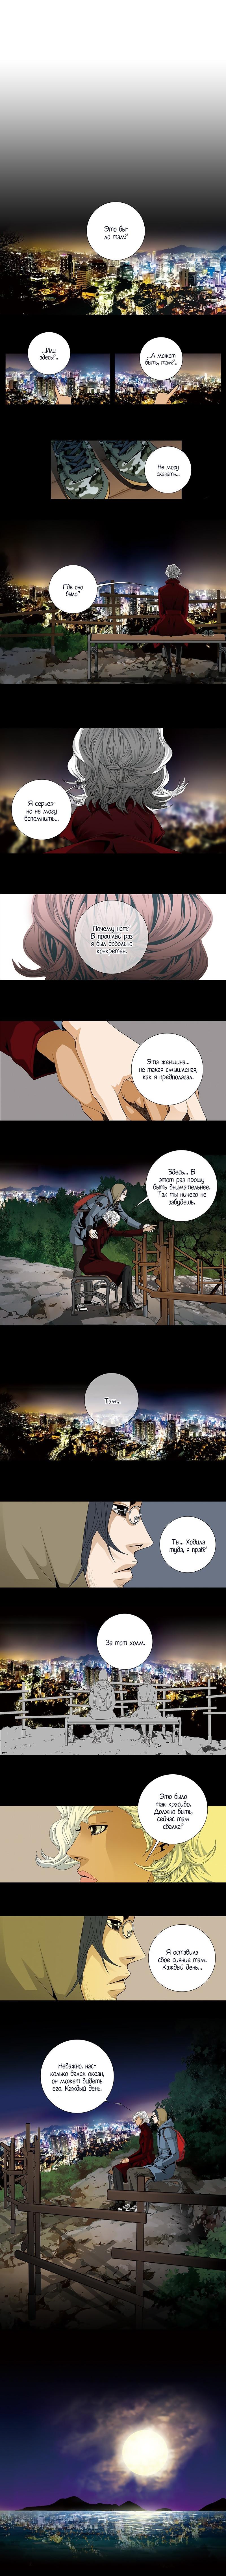 https://r1.ninemanga.com/comics/pic2/29/28573/344349/151207905467.jpg Page 2